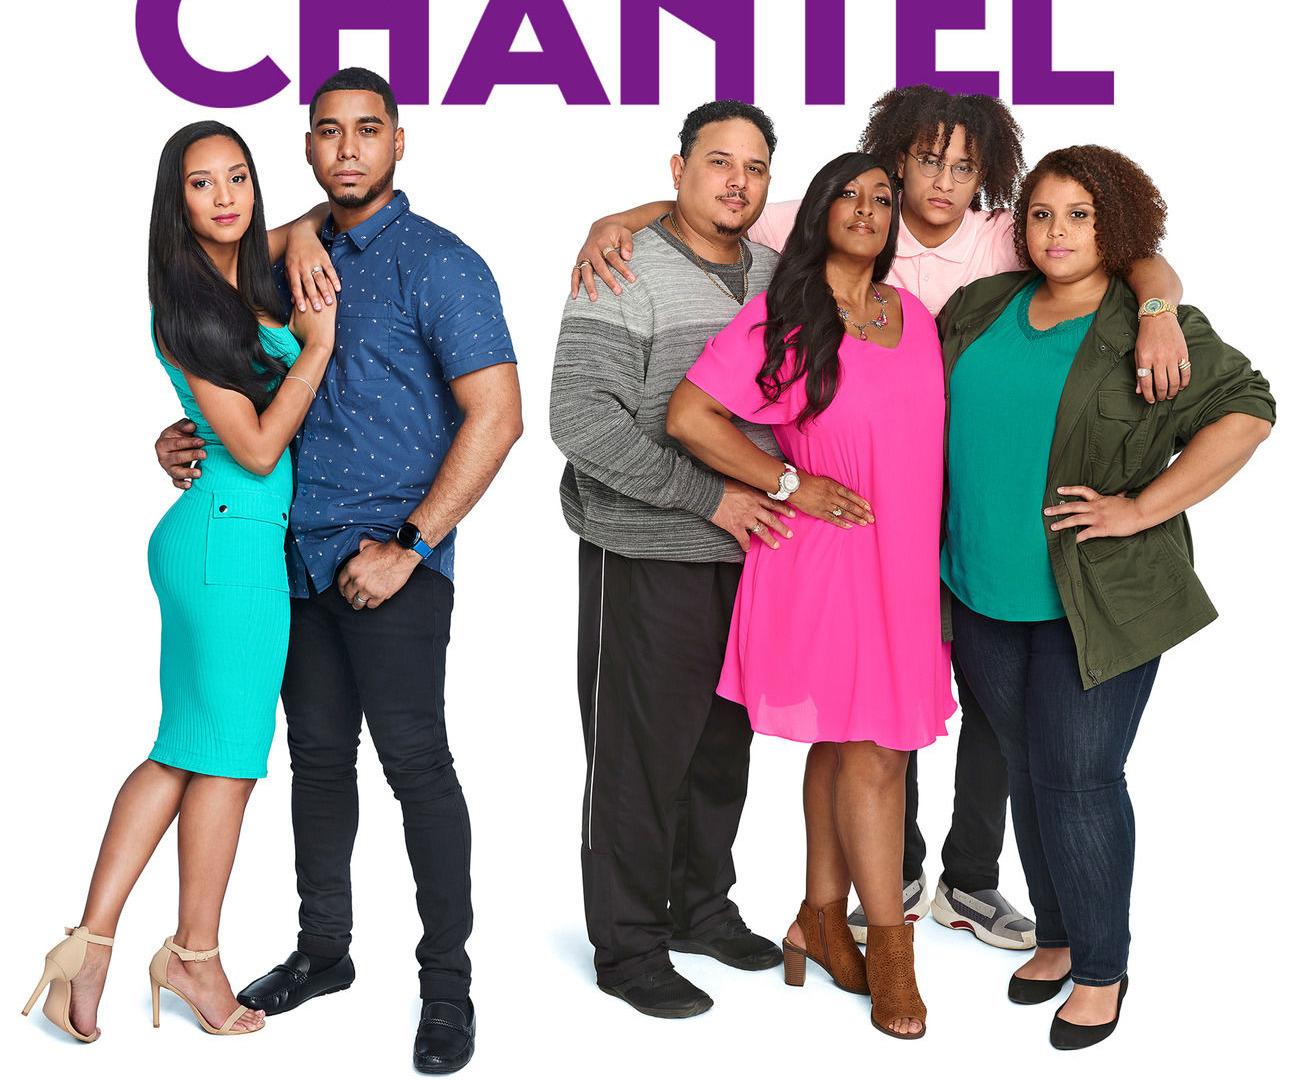 Show The Family Chantel